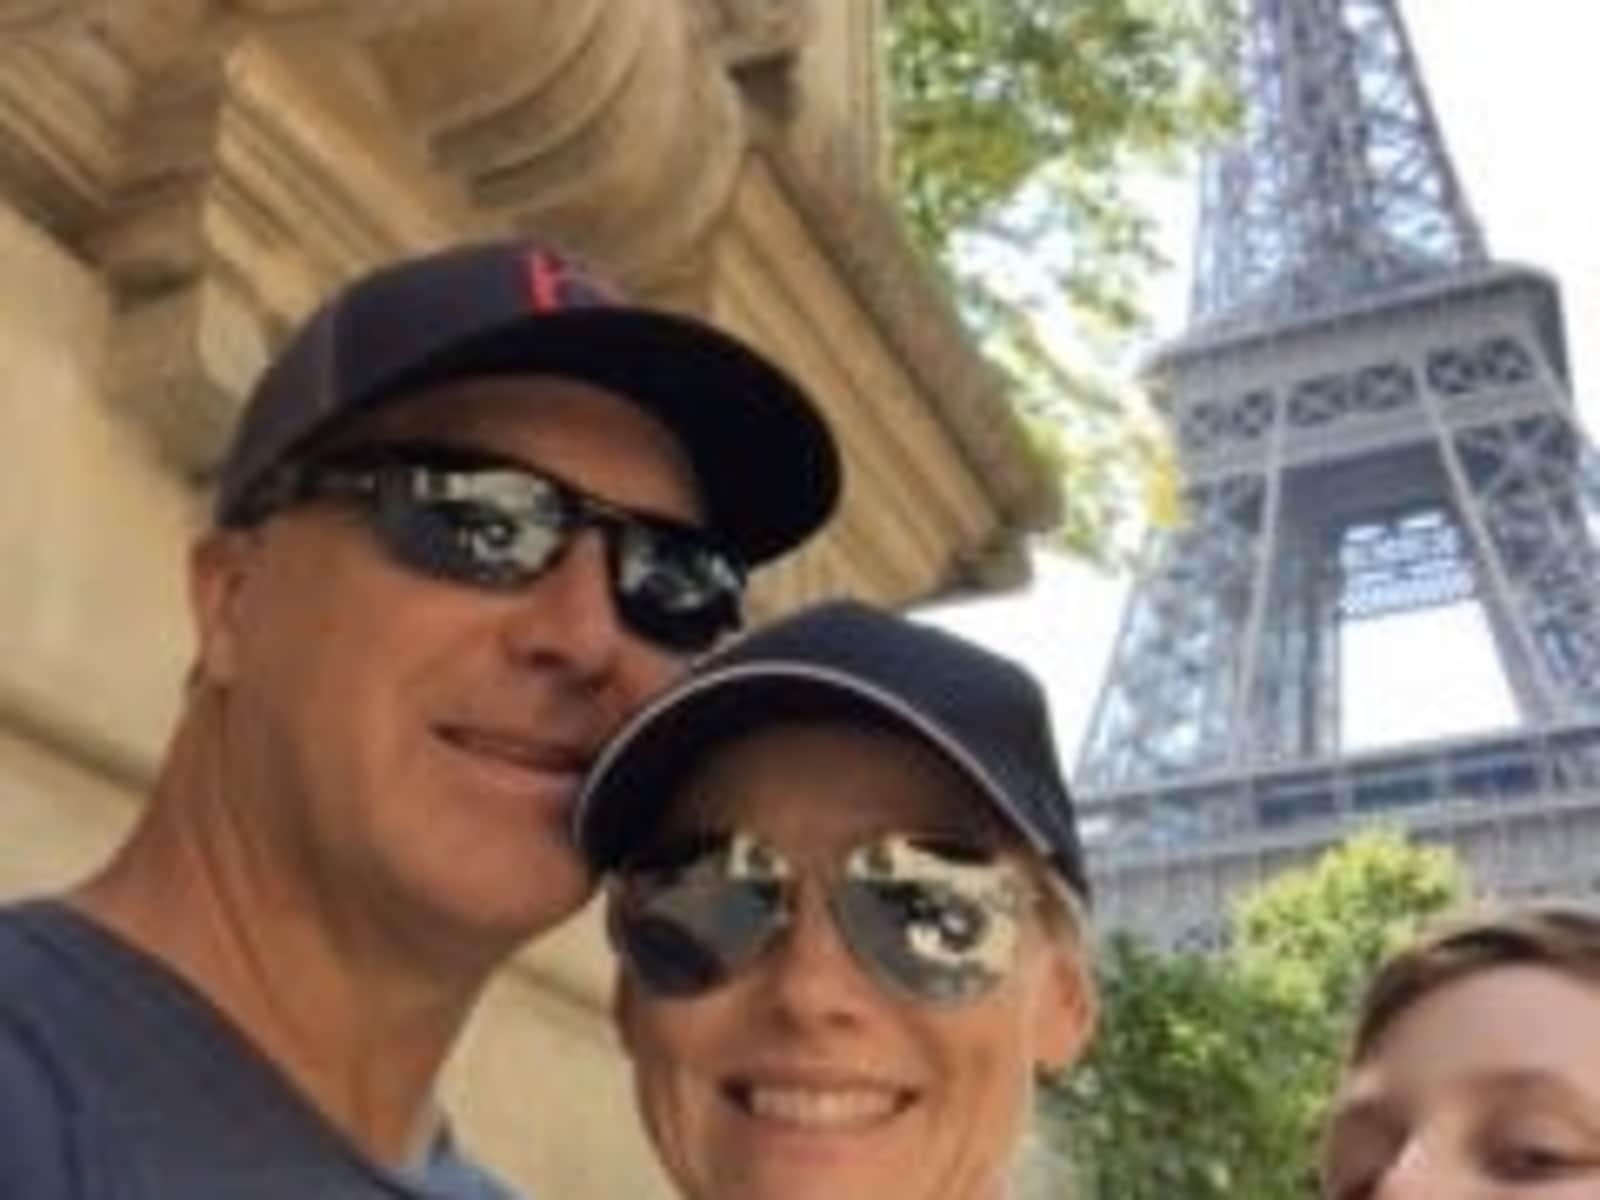 Ian & Gina from Rocklin, California, United States